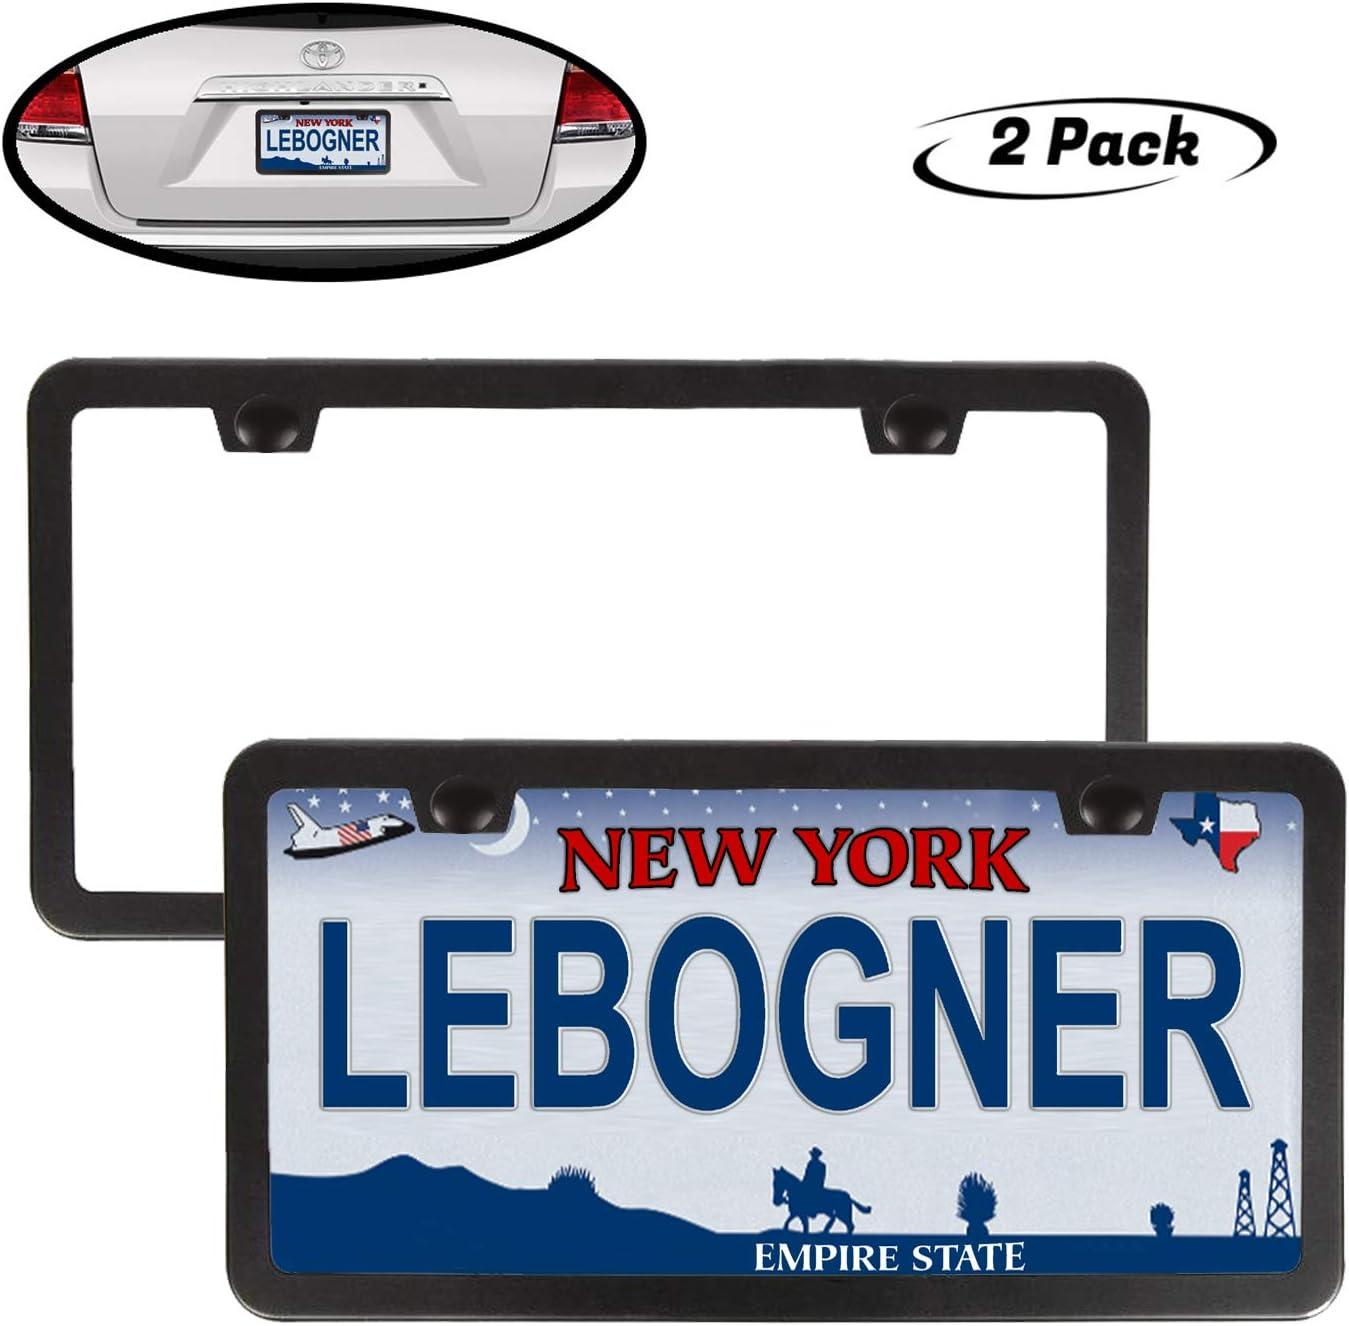 Lebogner Car License Plate Frames, 2 Pack Matte Aluminum Slim Design Plate Frames Fits Standard US Plates, 2 Hole Stainless Steel Black Unbreakable Frames To Protect Plates, Mounting Hardware Included